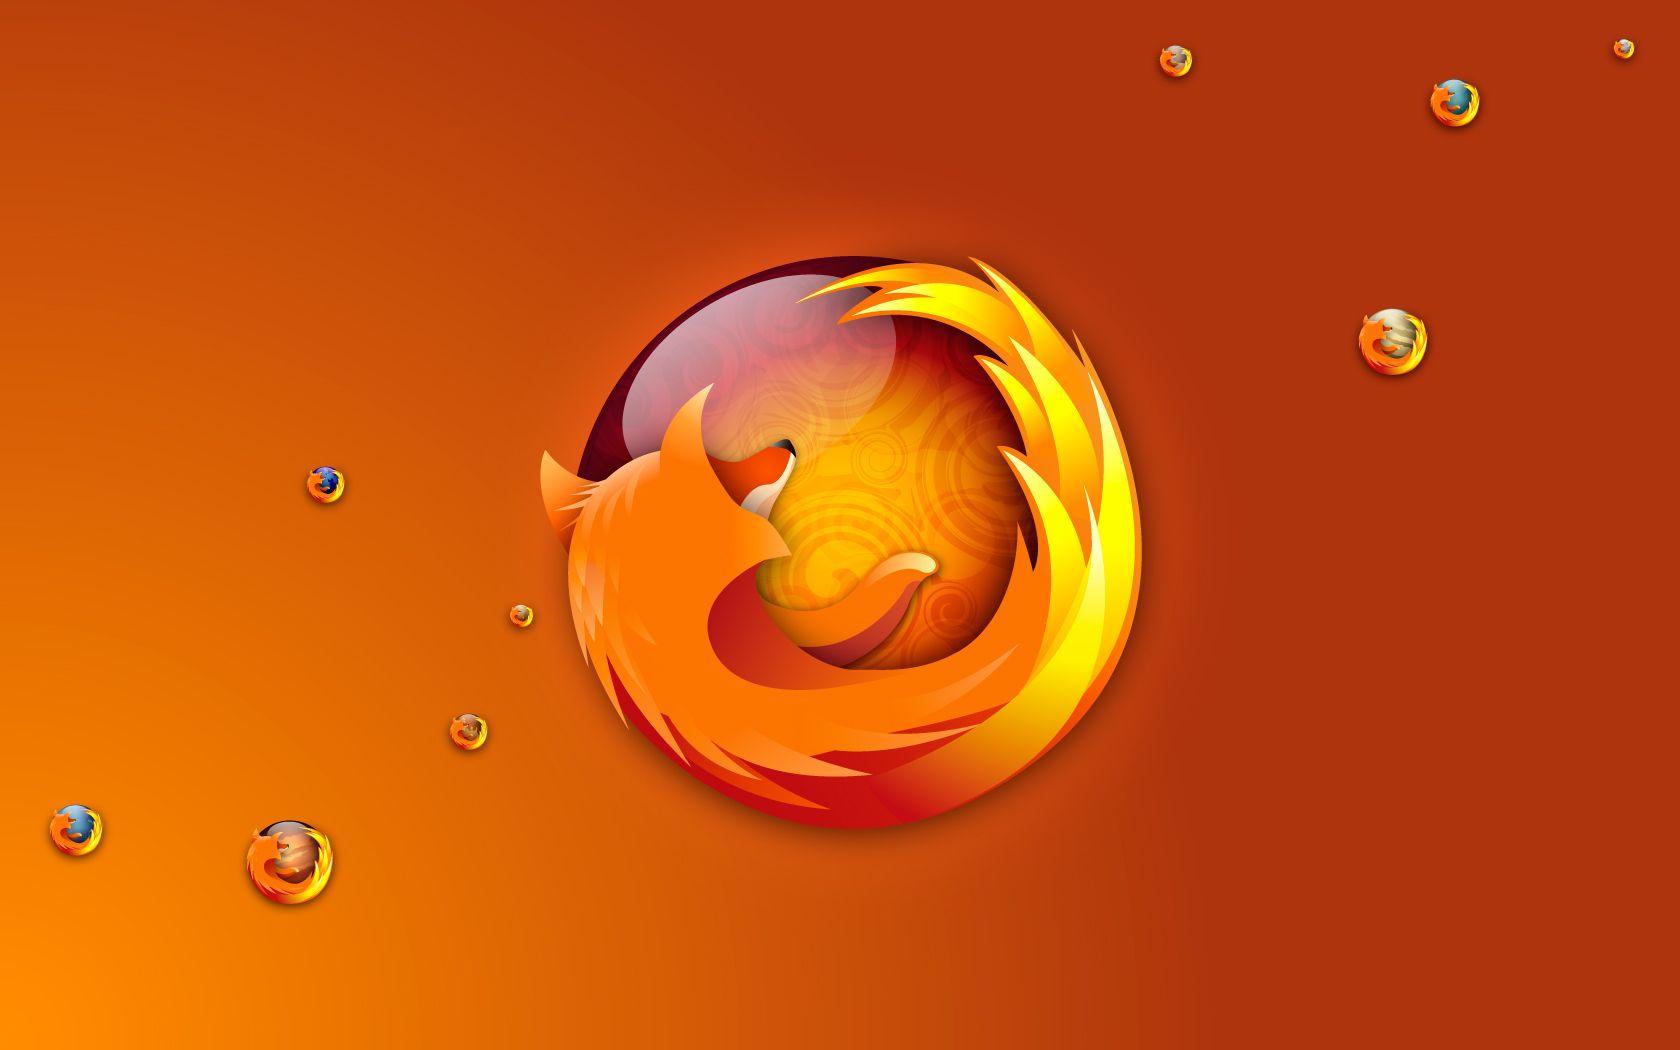 firefox background image